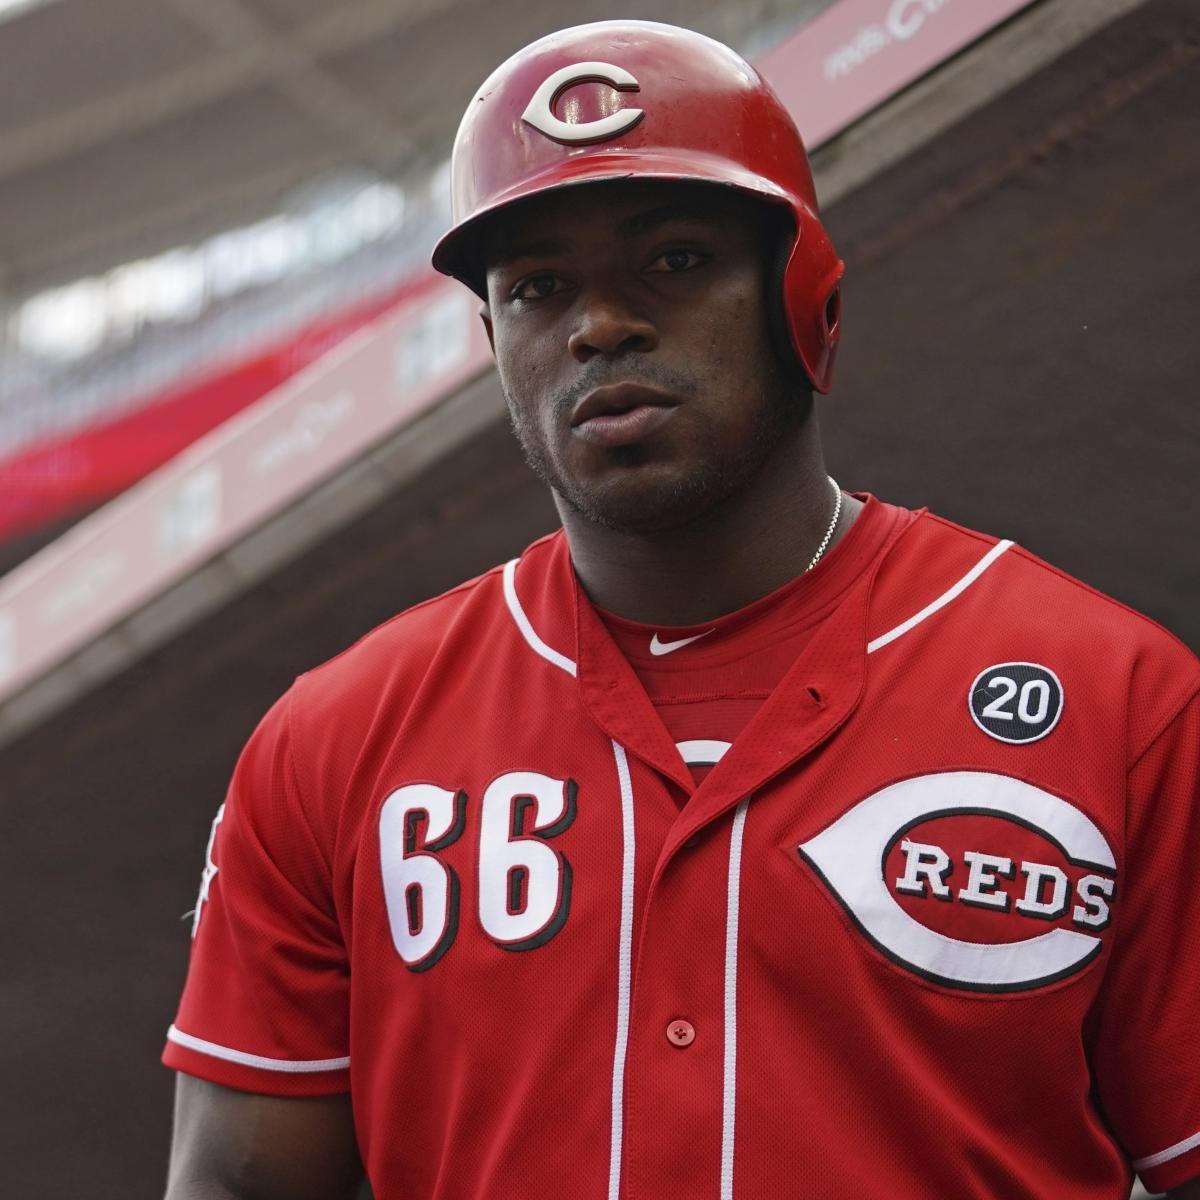 Mlb Trade Rumors Reds Of Yasiel Puig Drawing Interest From Braves In 2020 Yasiel Puig Braves Atlanta Braves